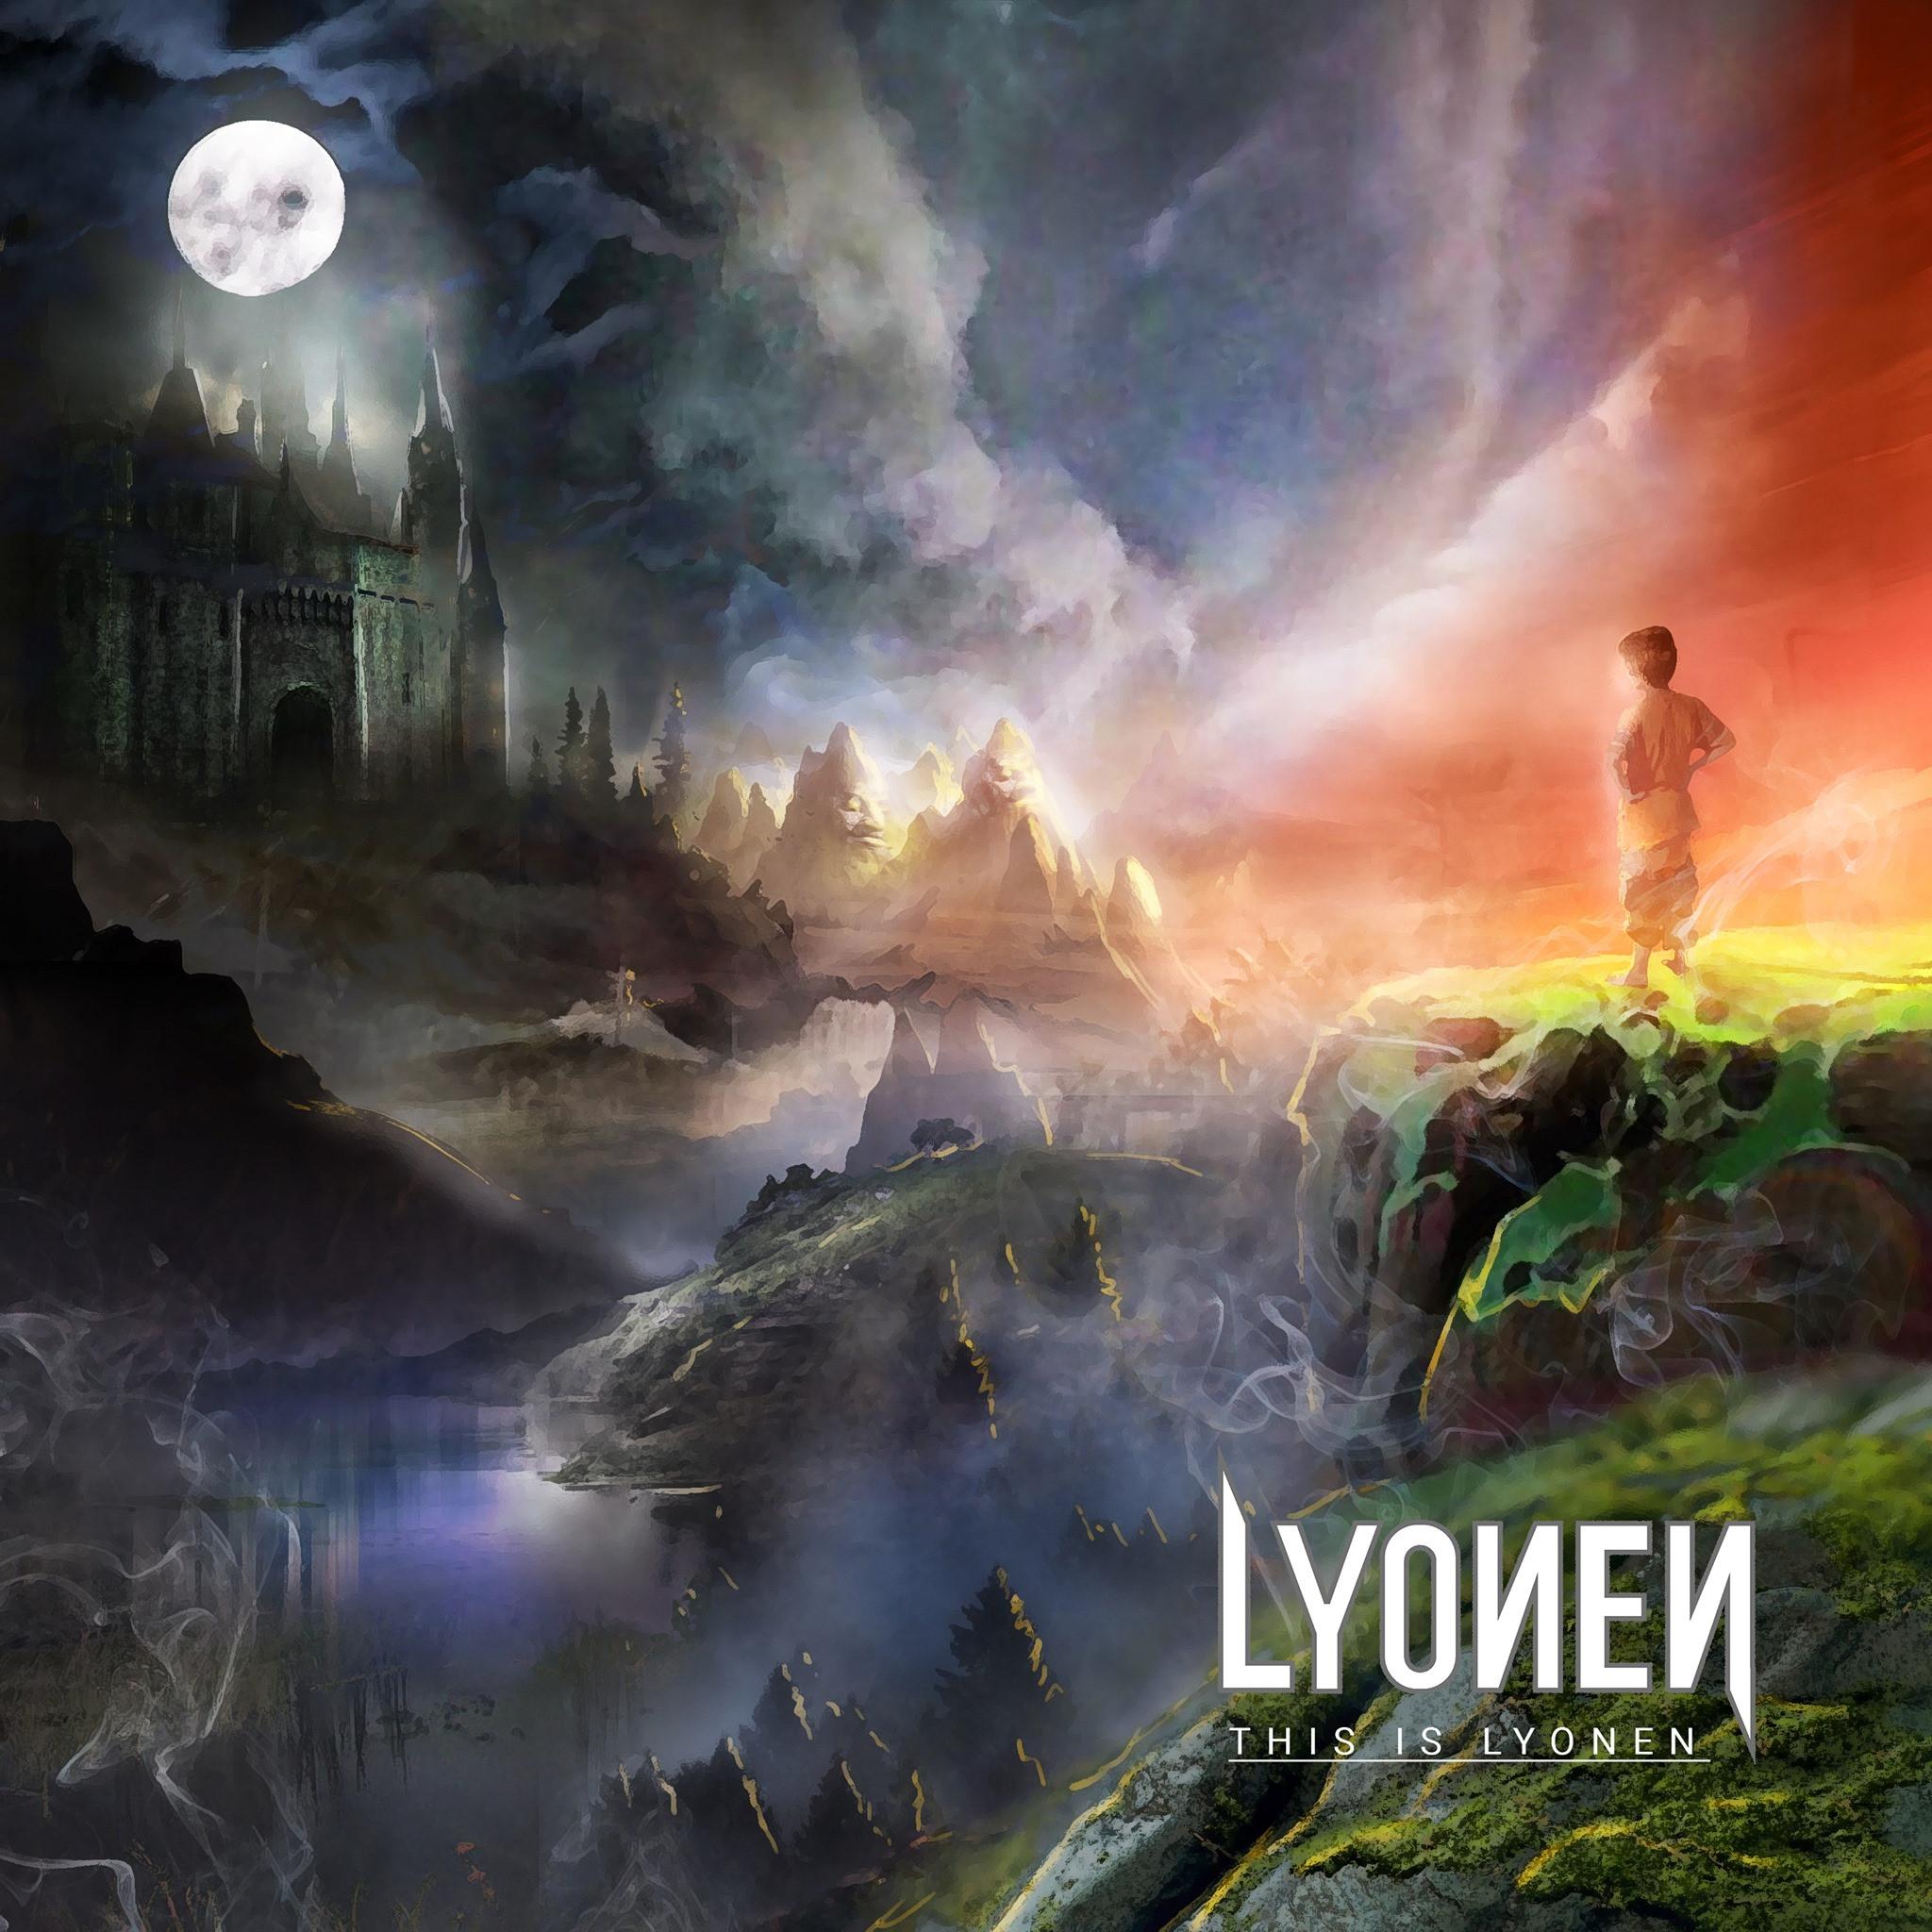 LYONEN